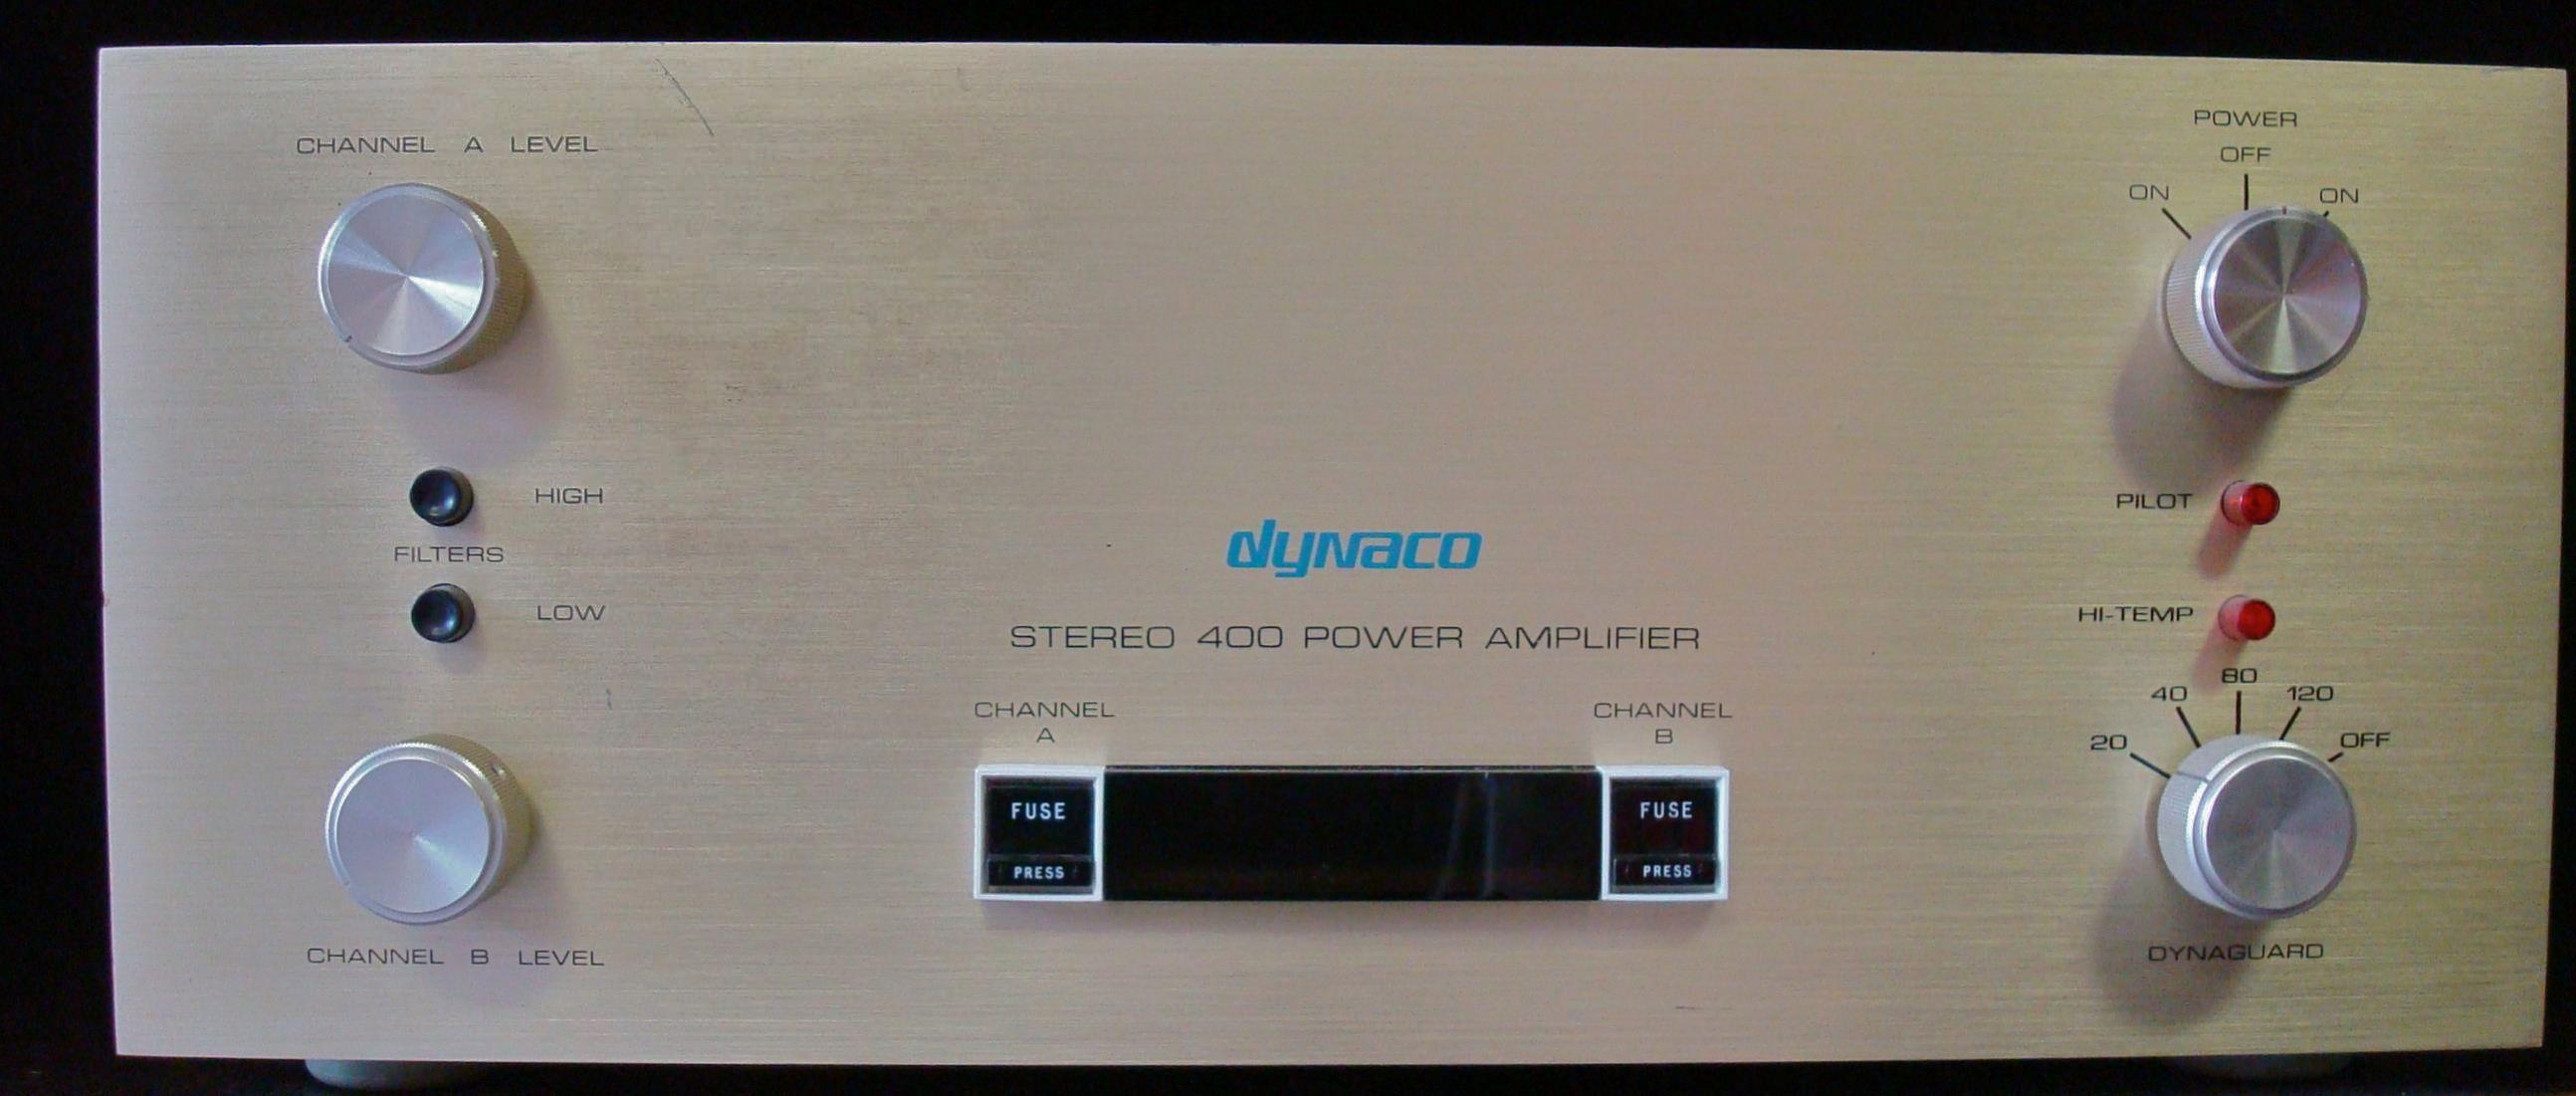 Dynaco Stereo 400, a popular DIY kit  | sound | Diy kits